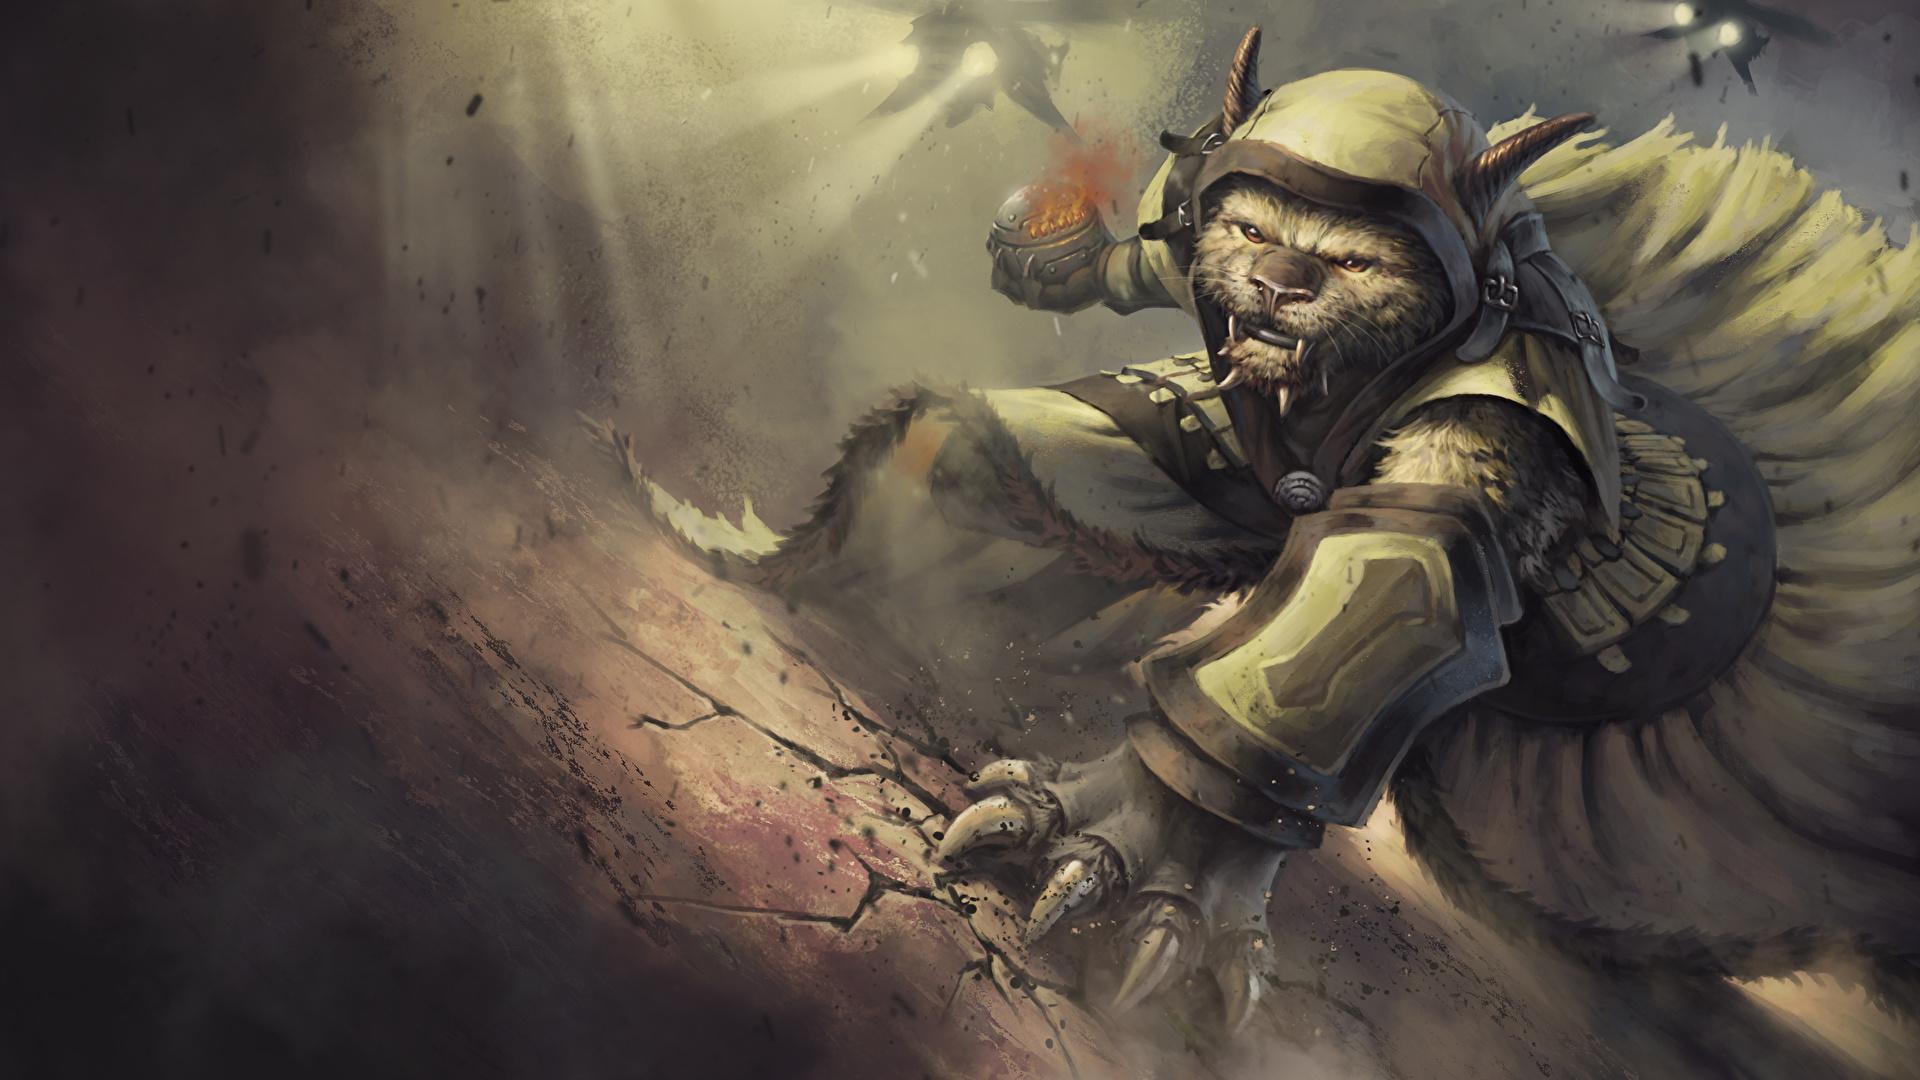 Image Guild Wars 2 Warriors Fantasy Games 1920x1080